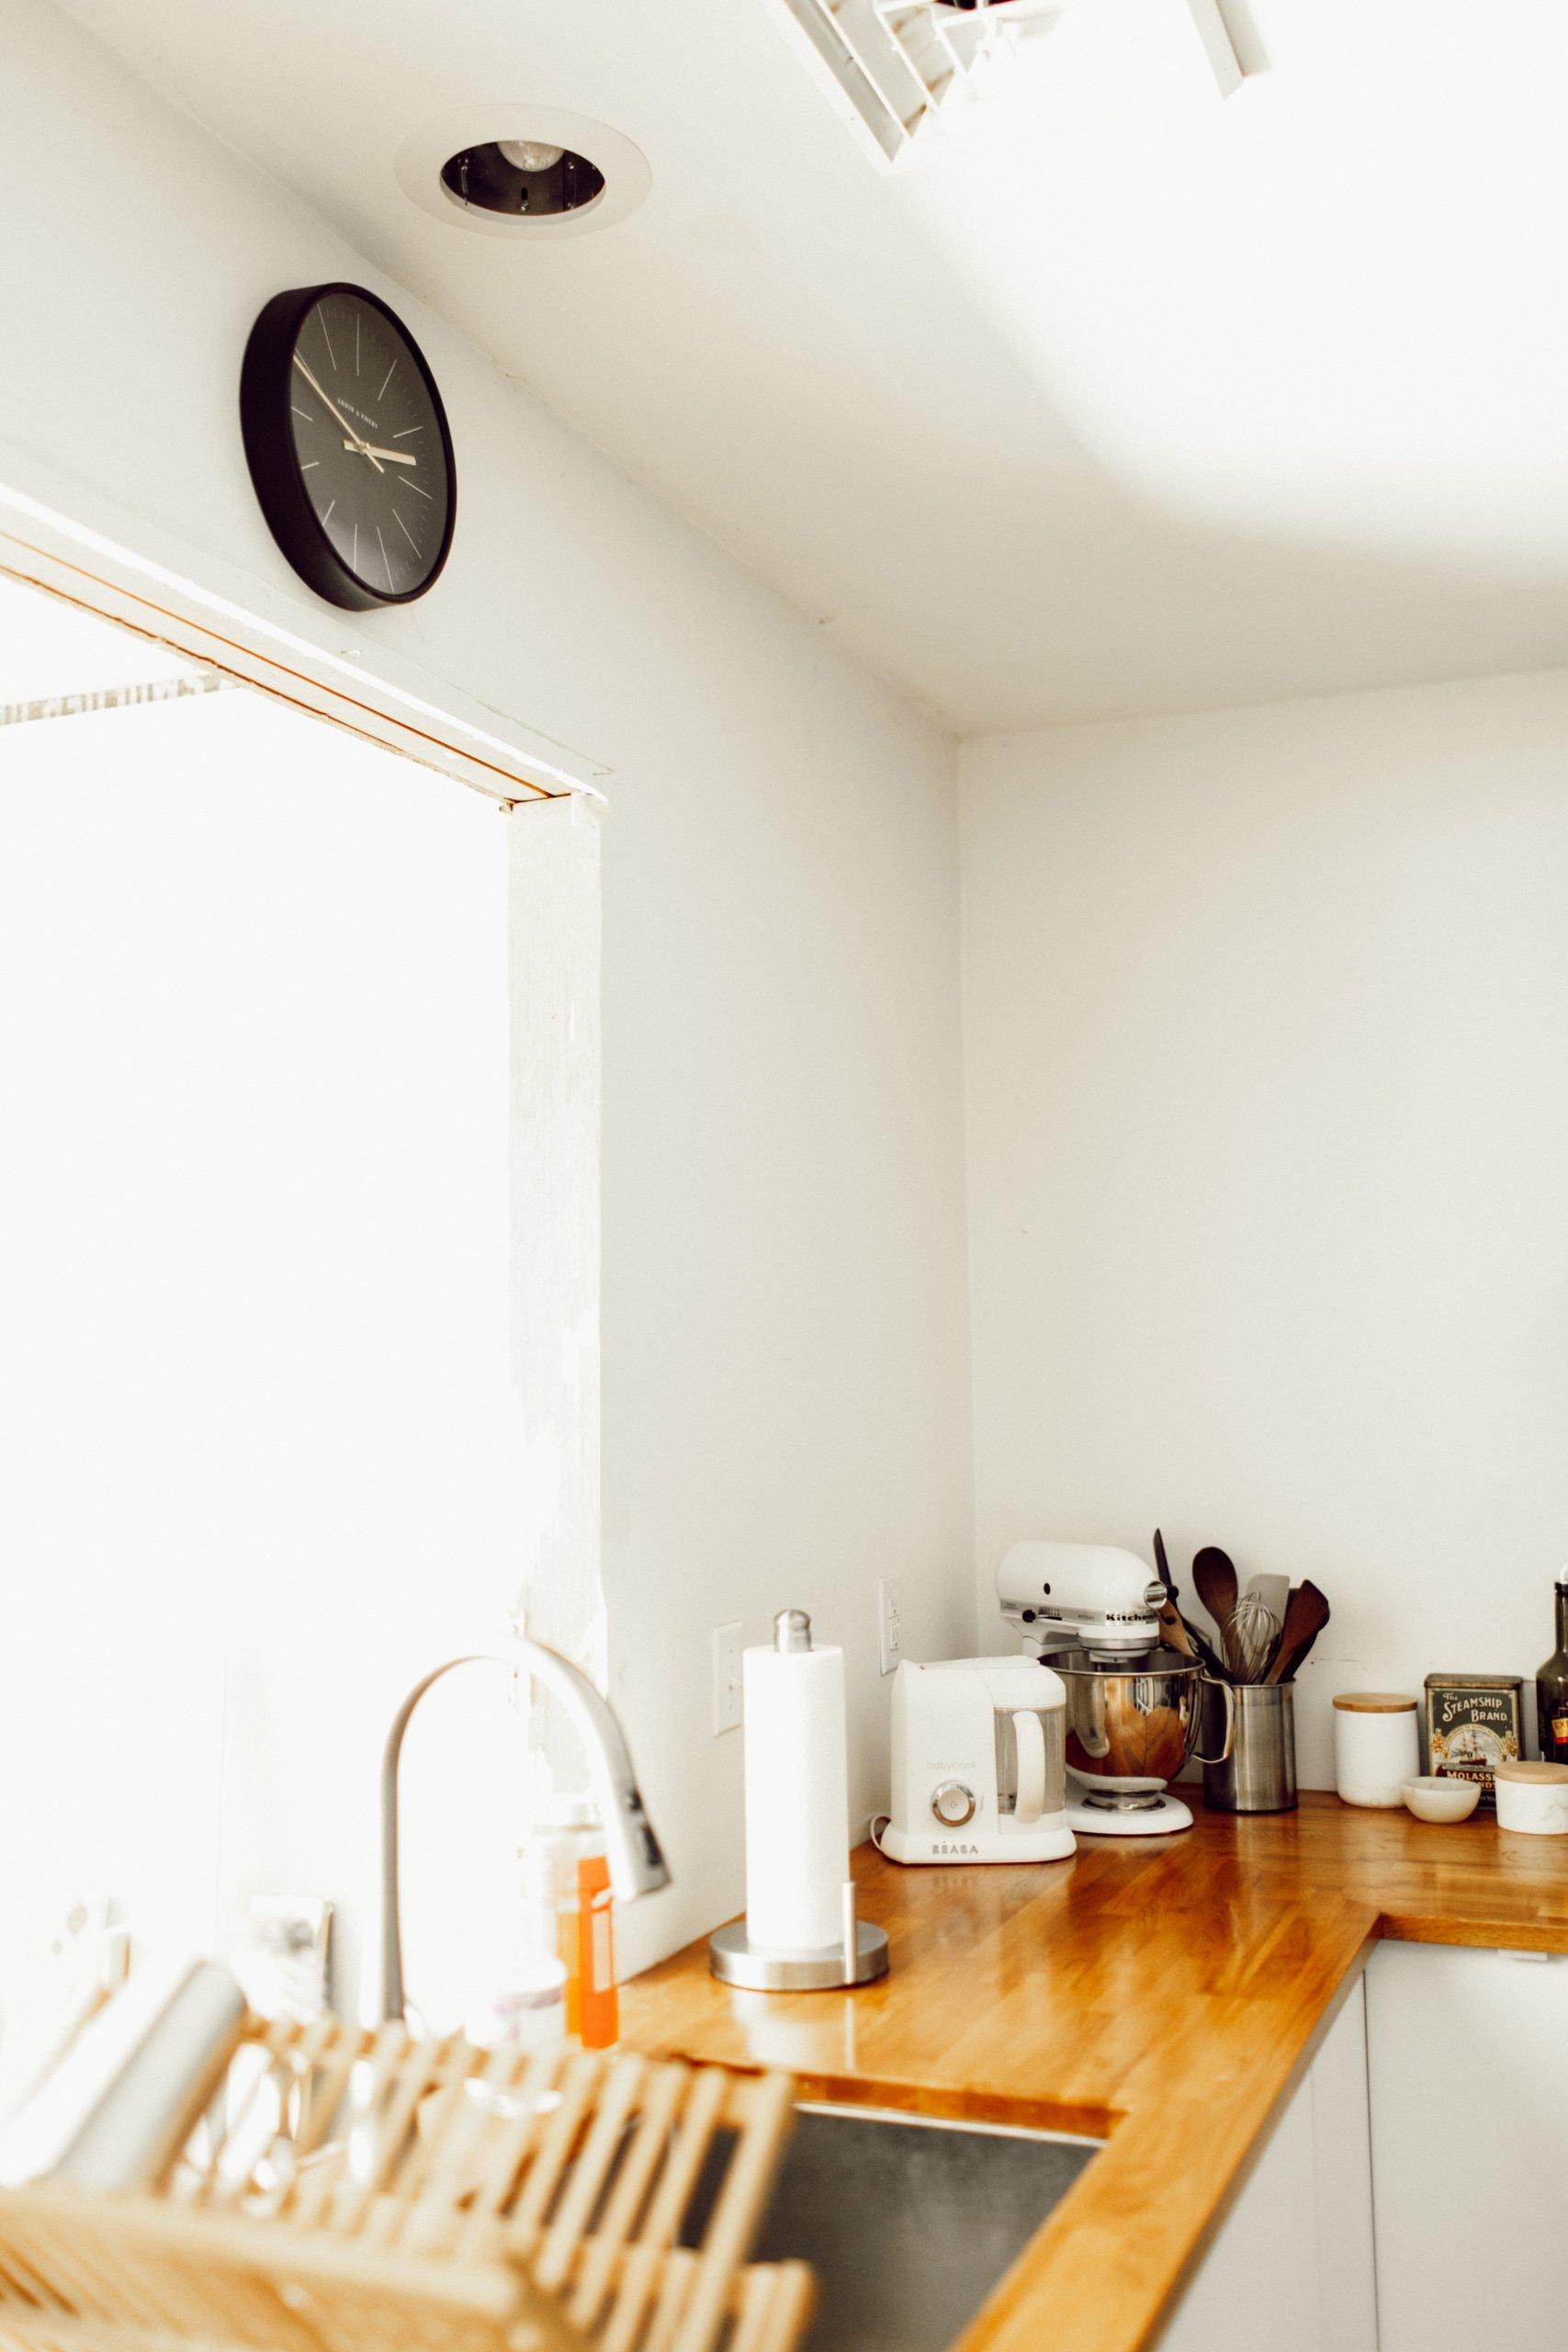 kitchen renovation remodel